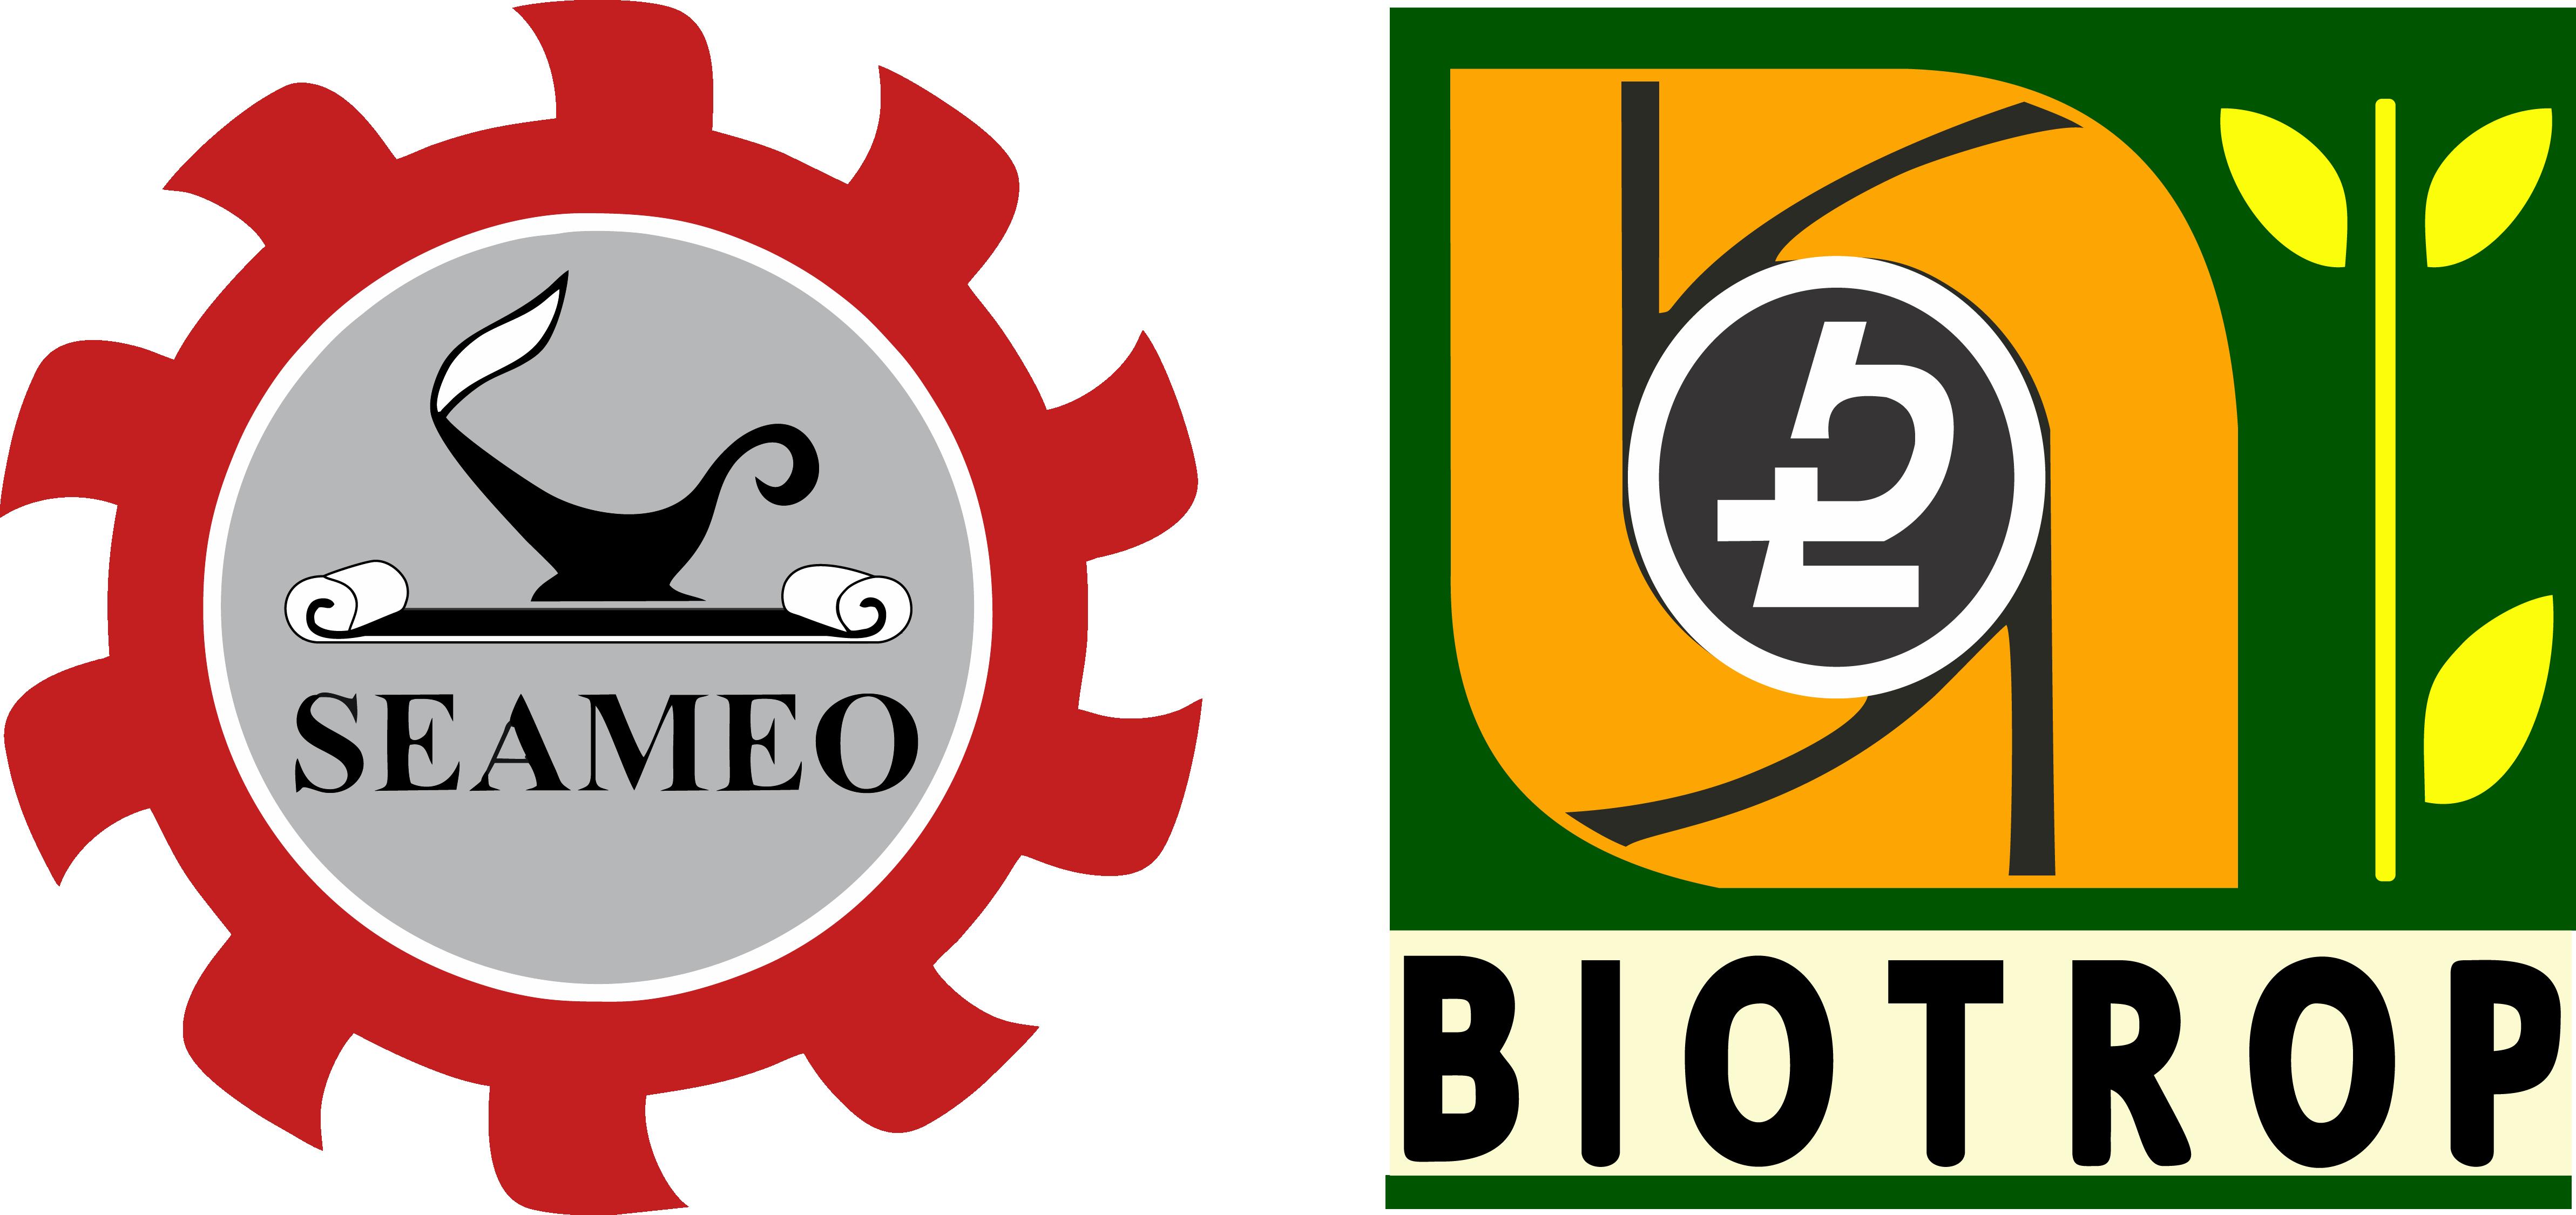 logo biotrop, BIOTROP logo